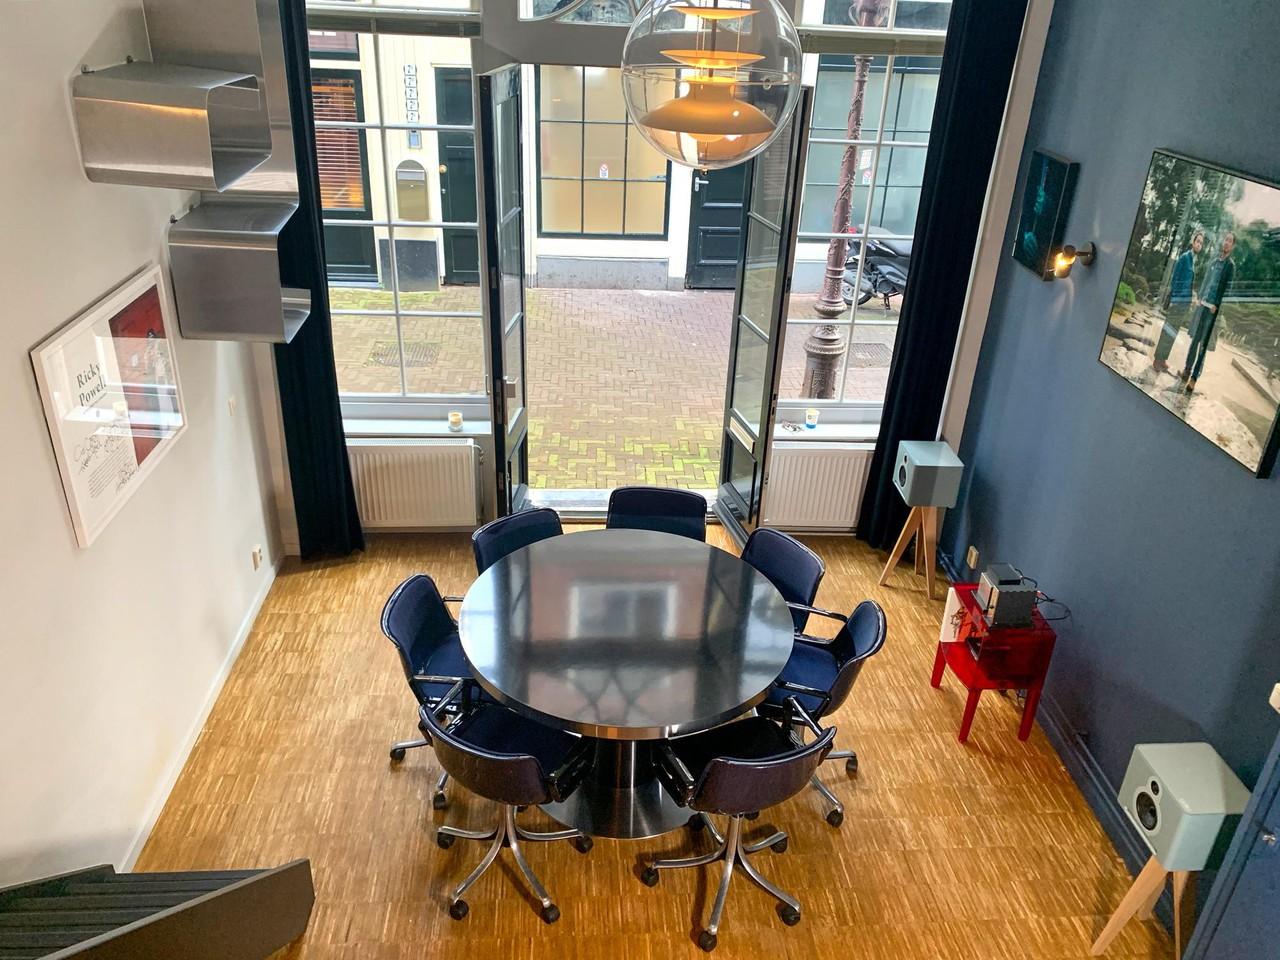 Amsterdam training rooms Salle de réunion Meeting Lounge Room image 0